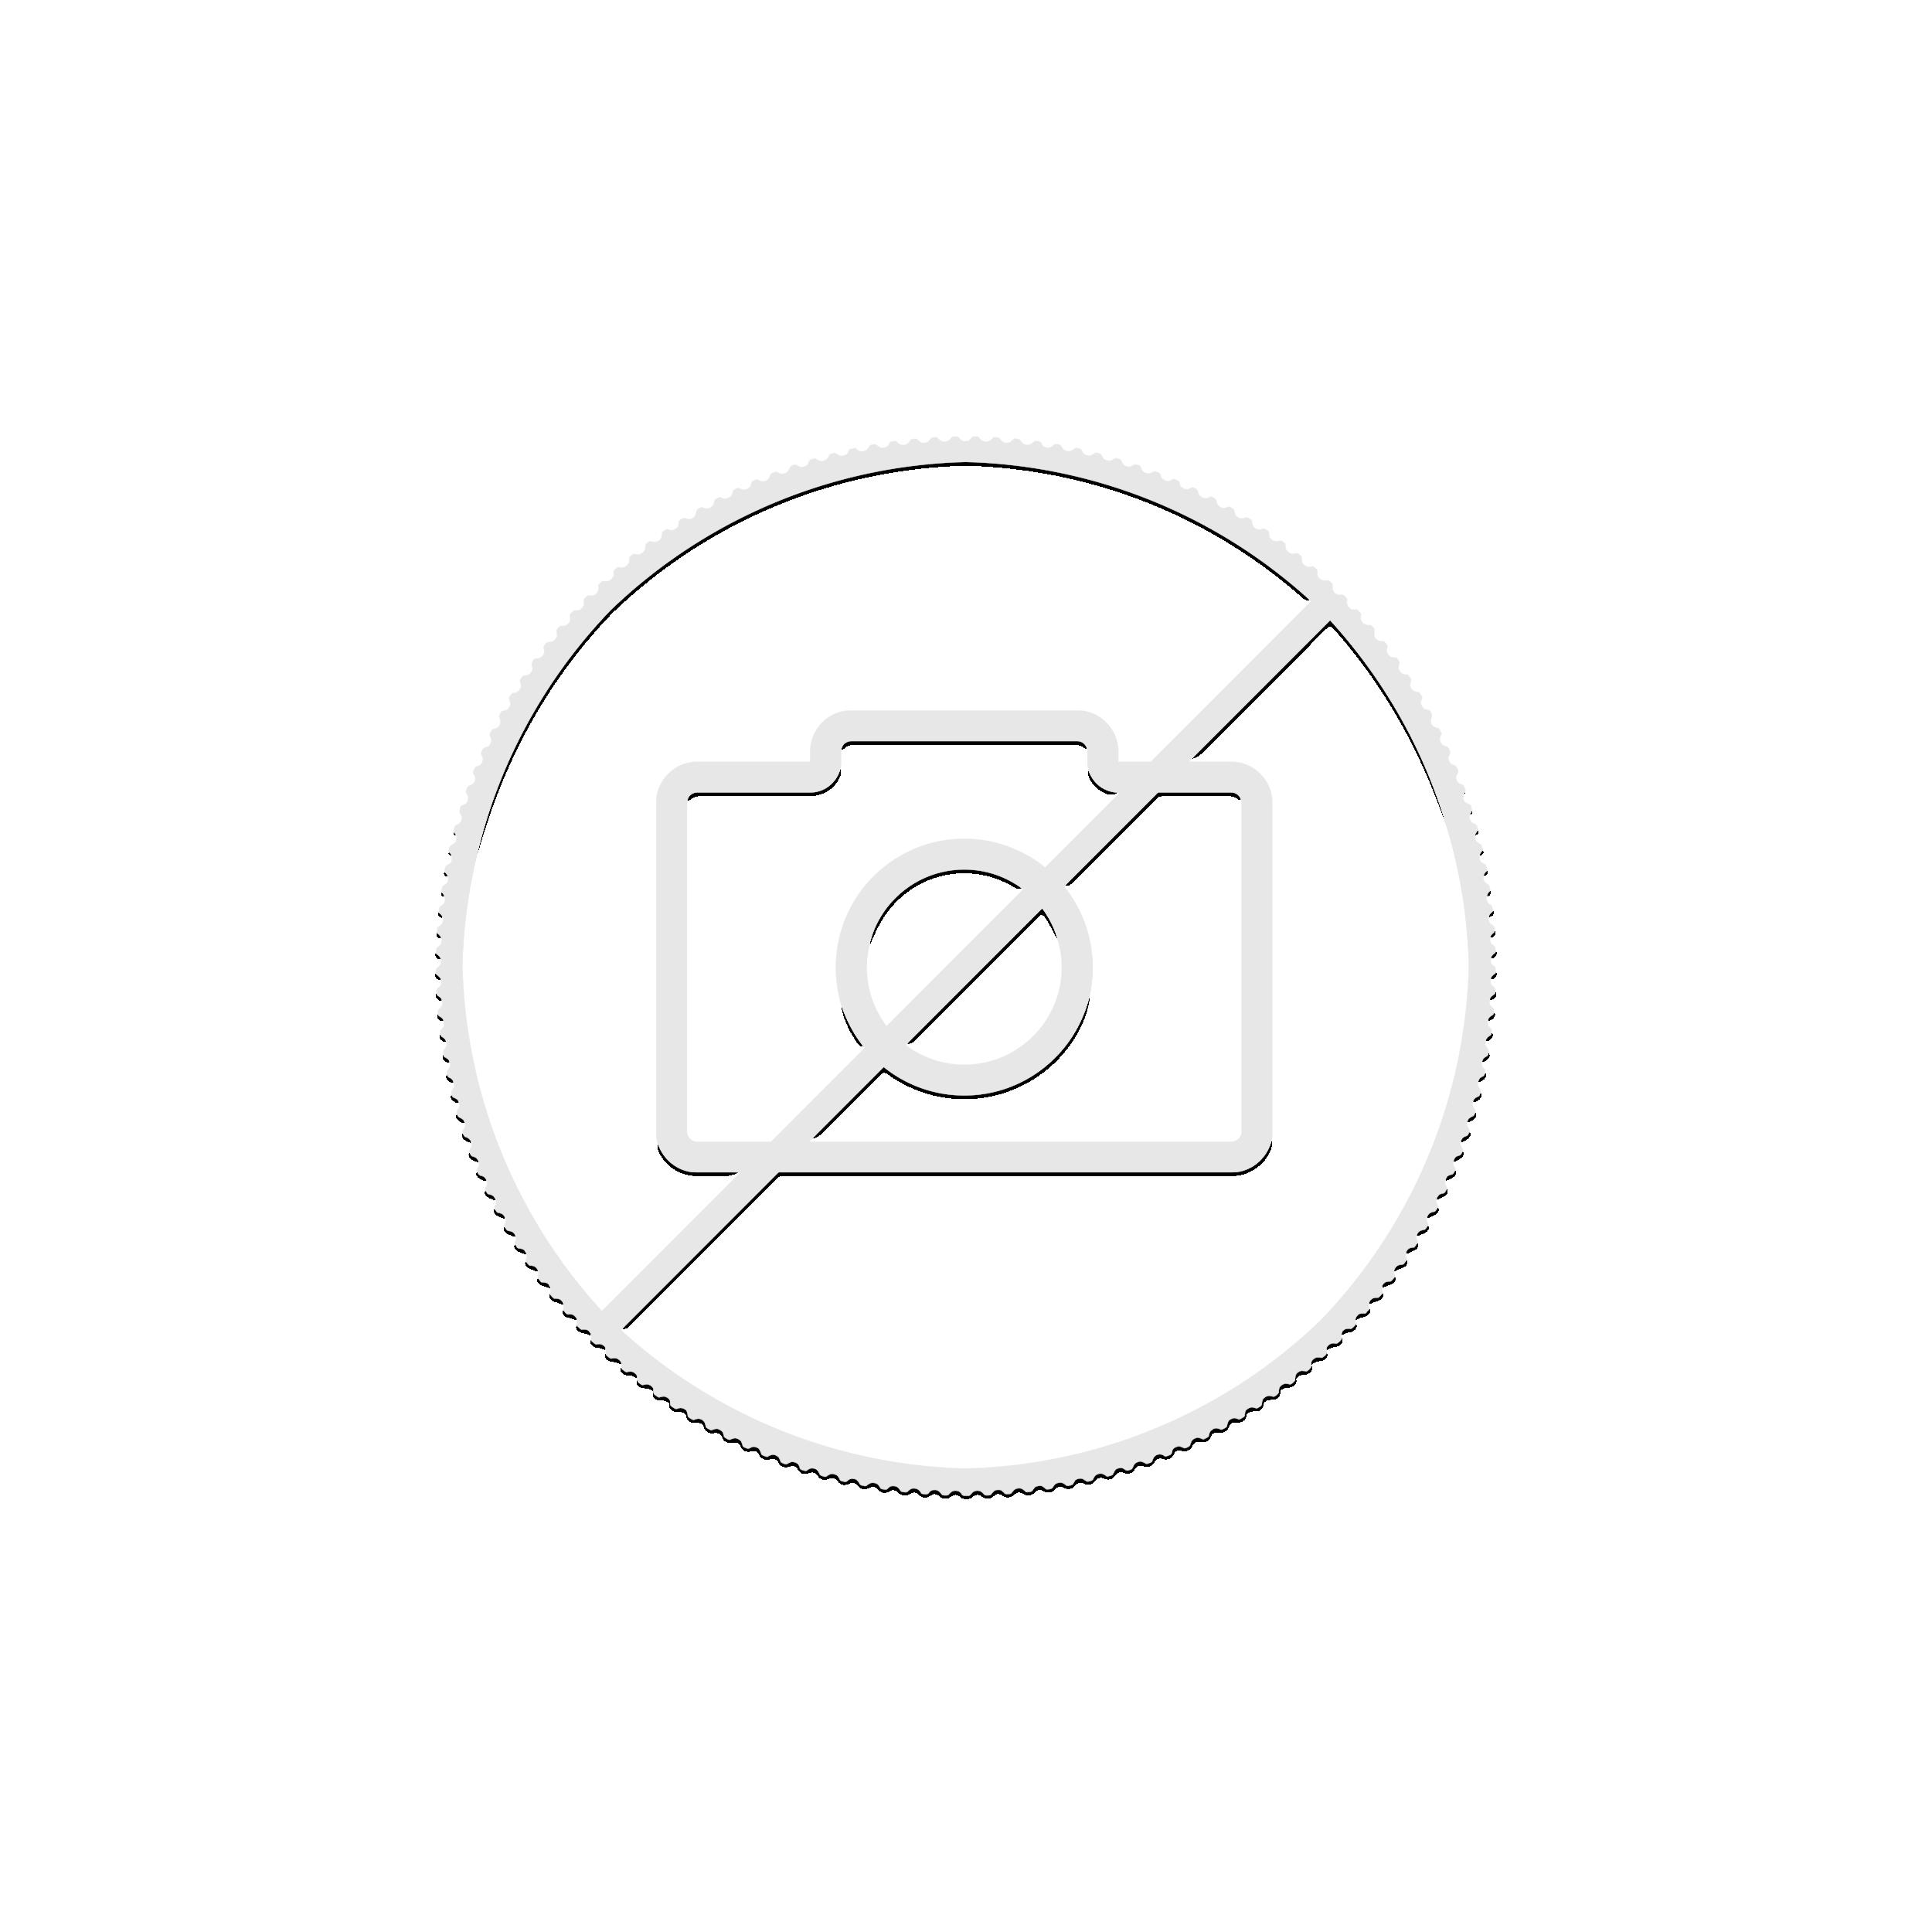 Gouden 50 Euro muntstuk Nederland 2004 Jubileum munt Amalia